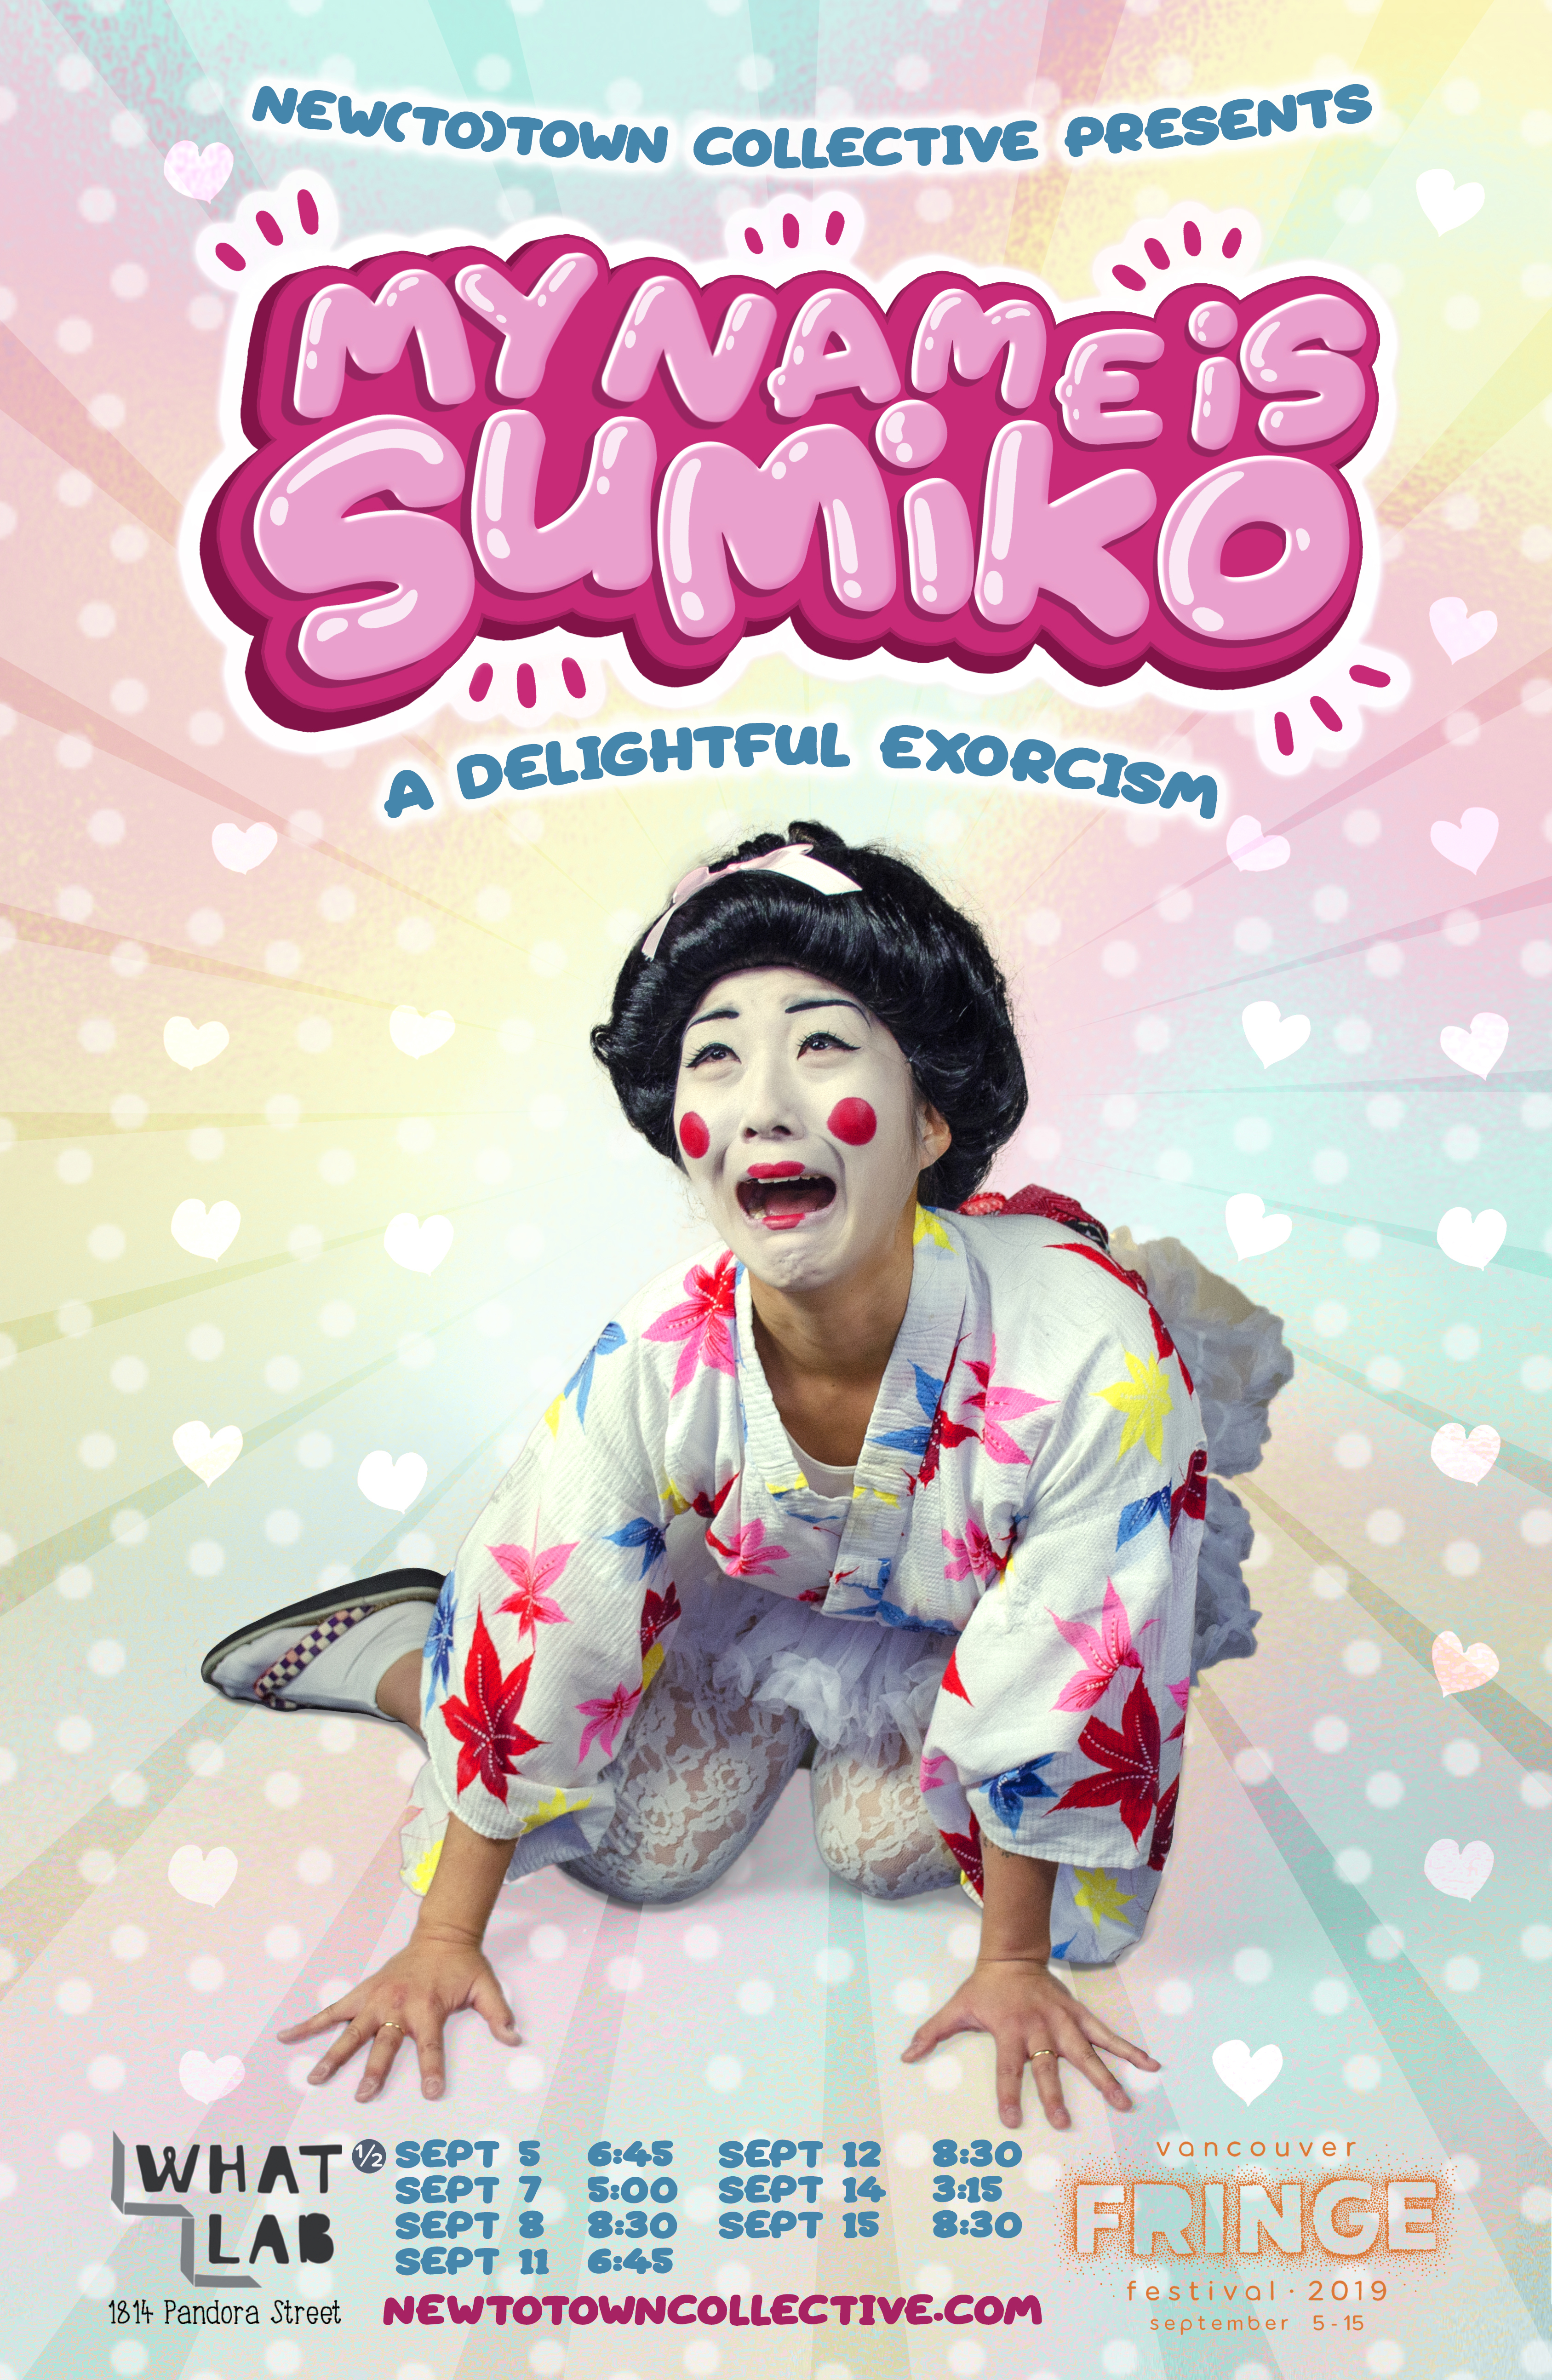 Sumiko-11x17 poster-VanFringe